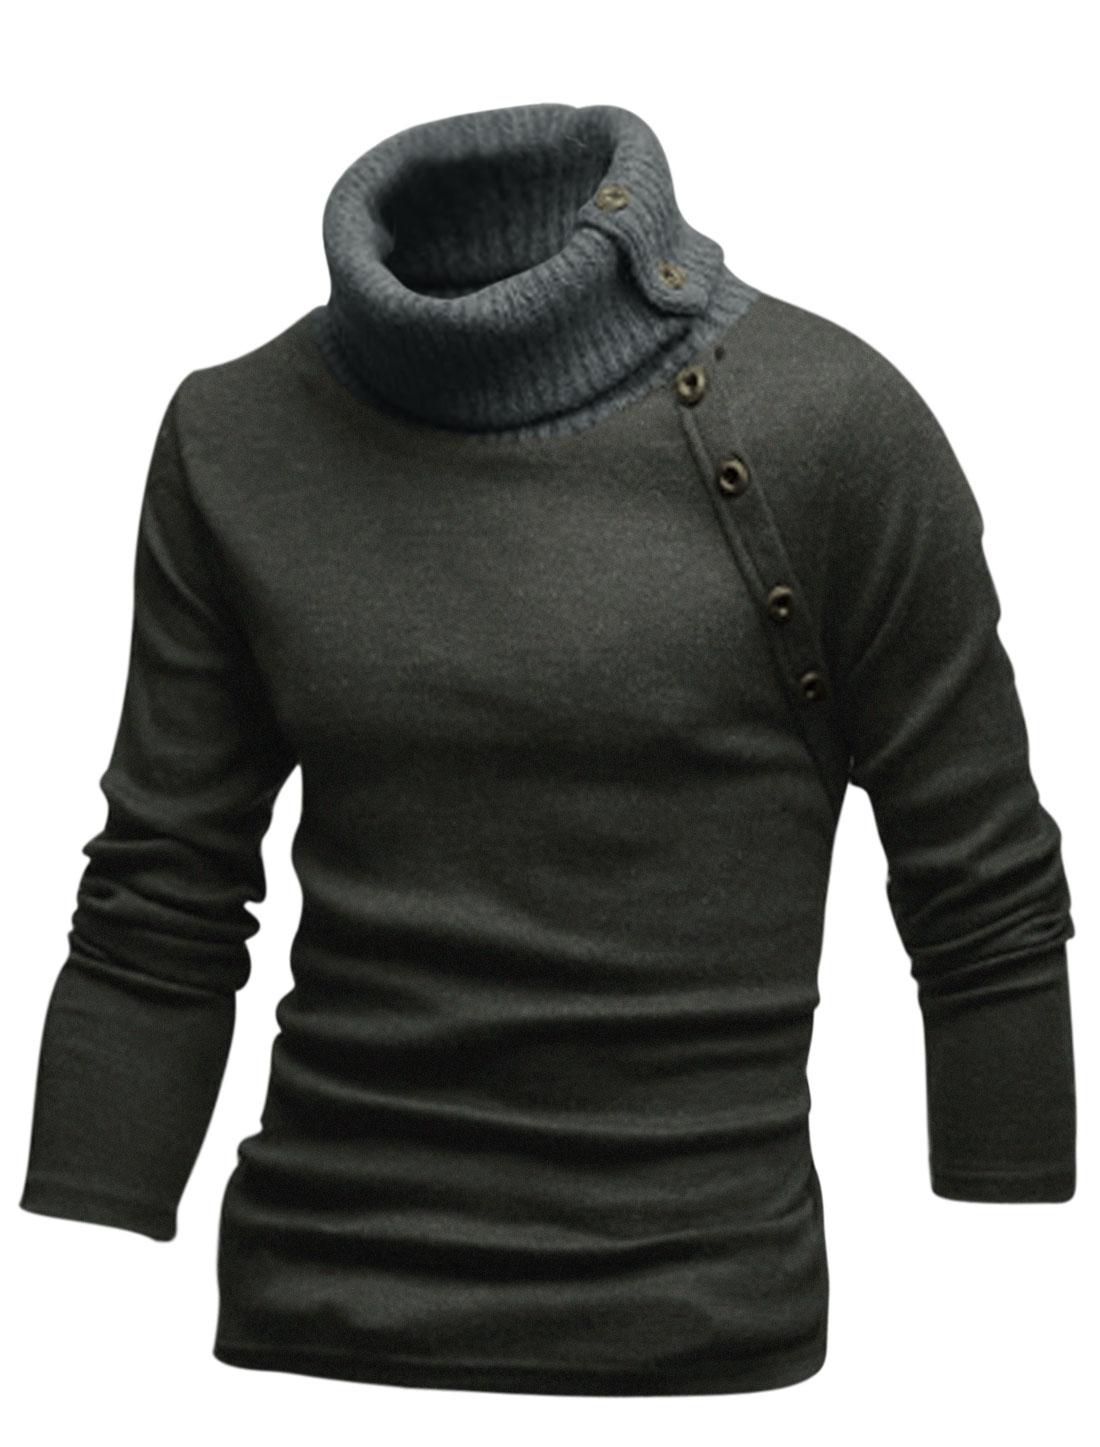 Men Cozy Fit Turtle Neck Buttons Decor Knit Shirt Dark Gray S